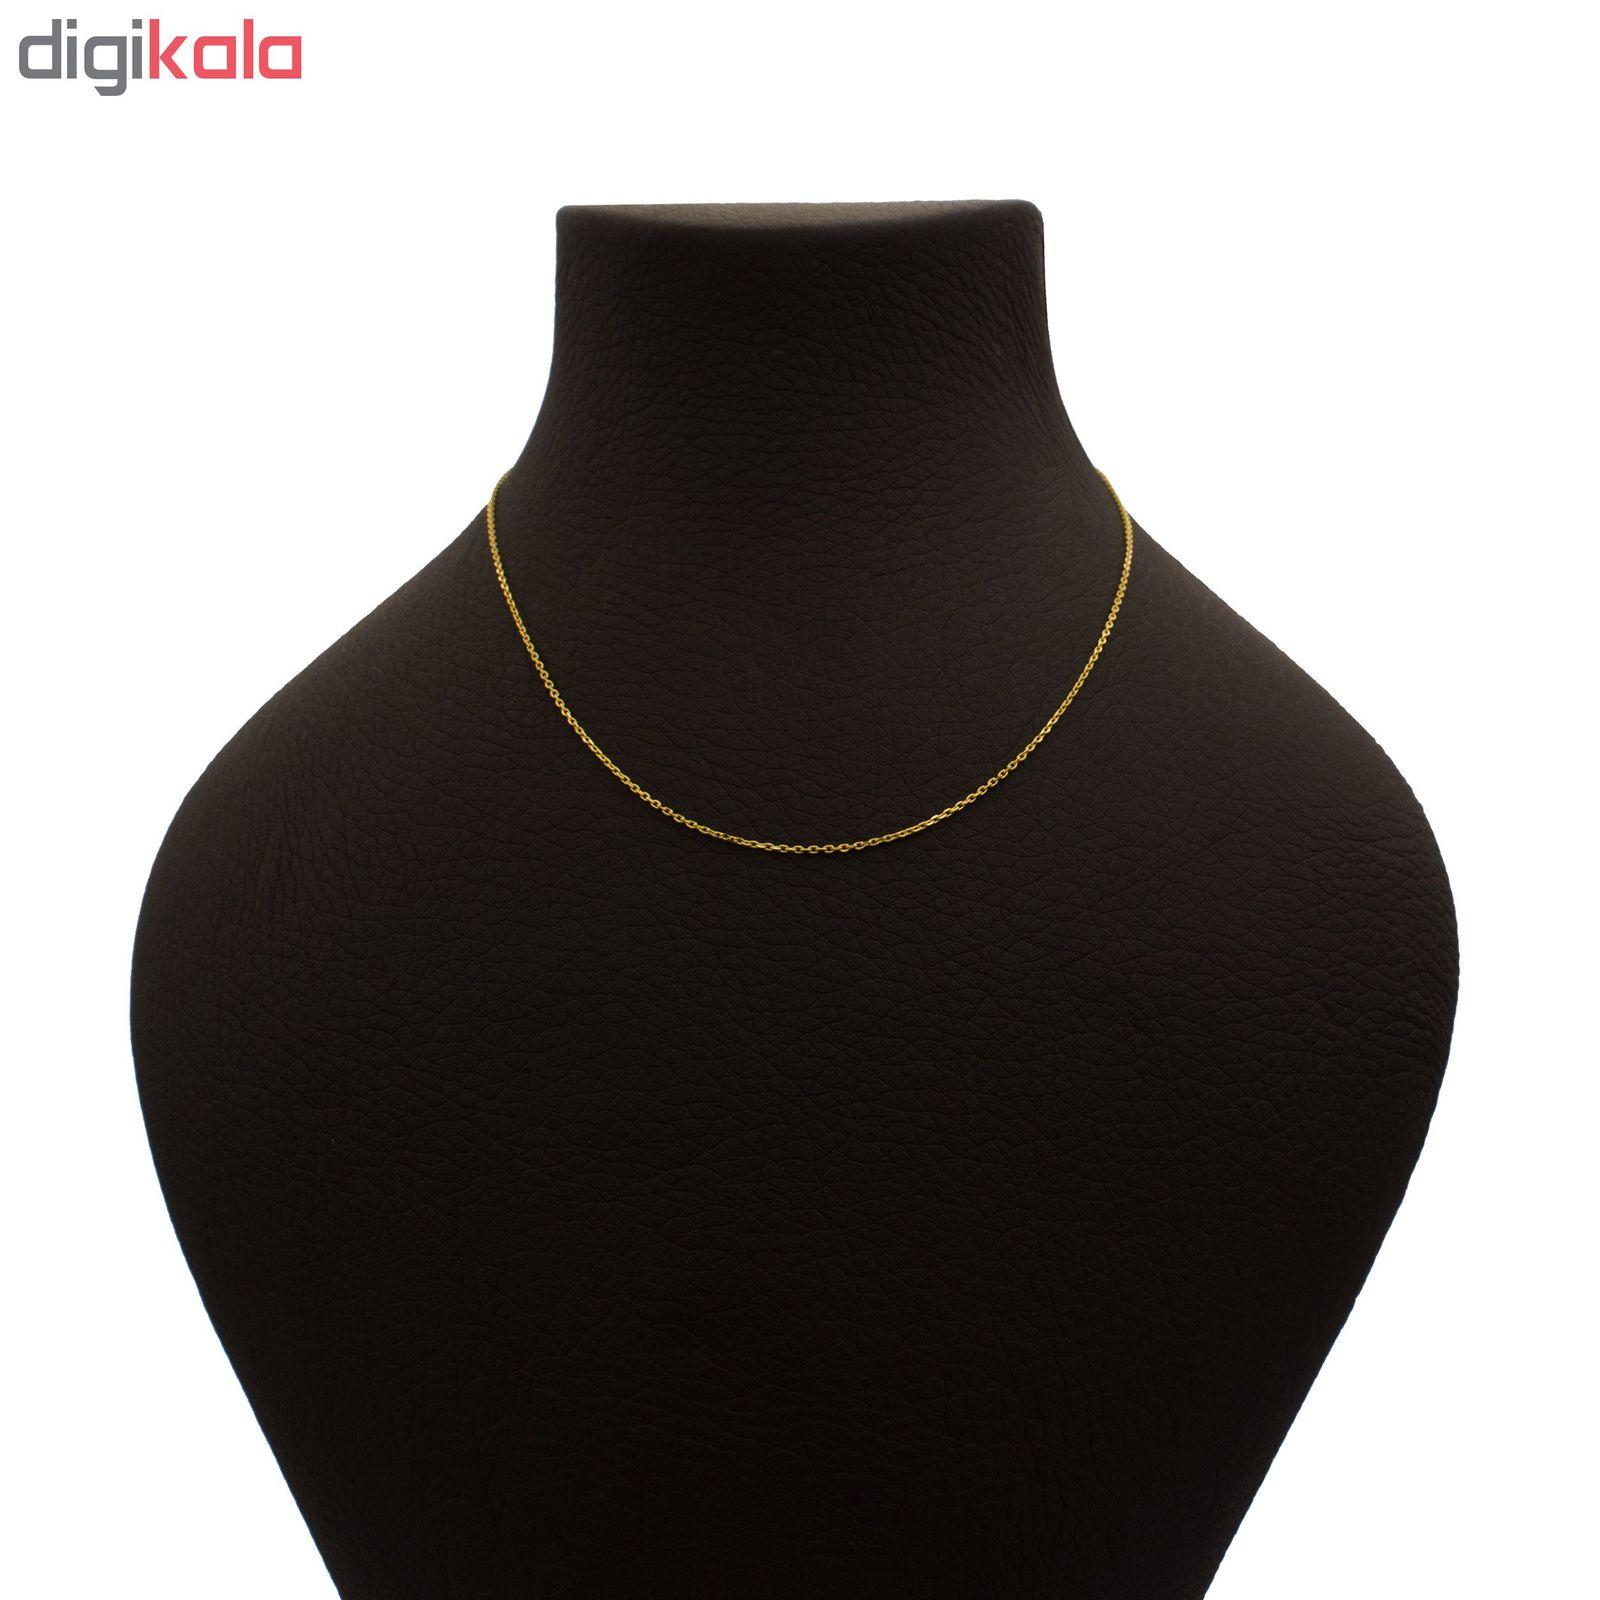 زنجیر طلا 18 عیار زنانه آرشا گالری کد 407A2479 main 1 1